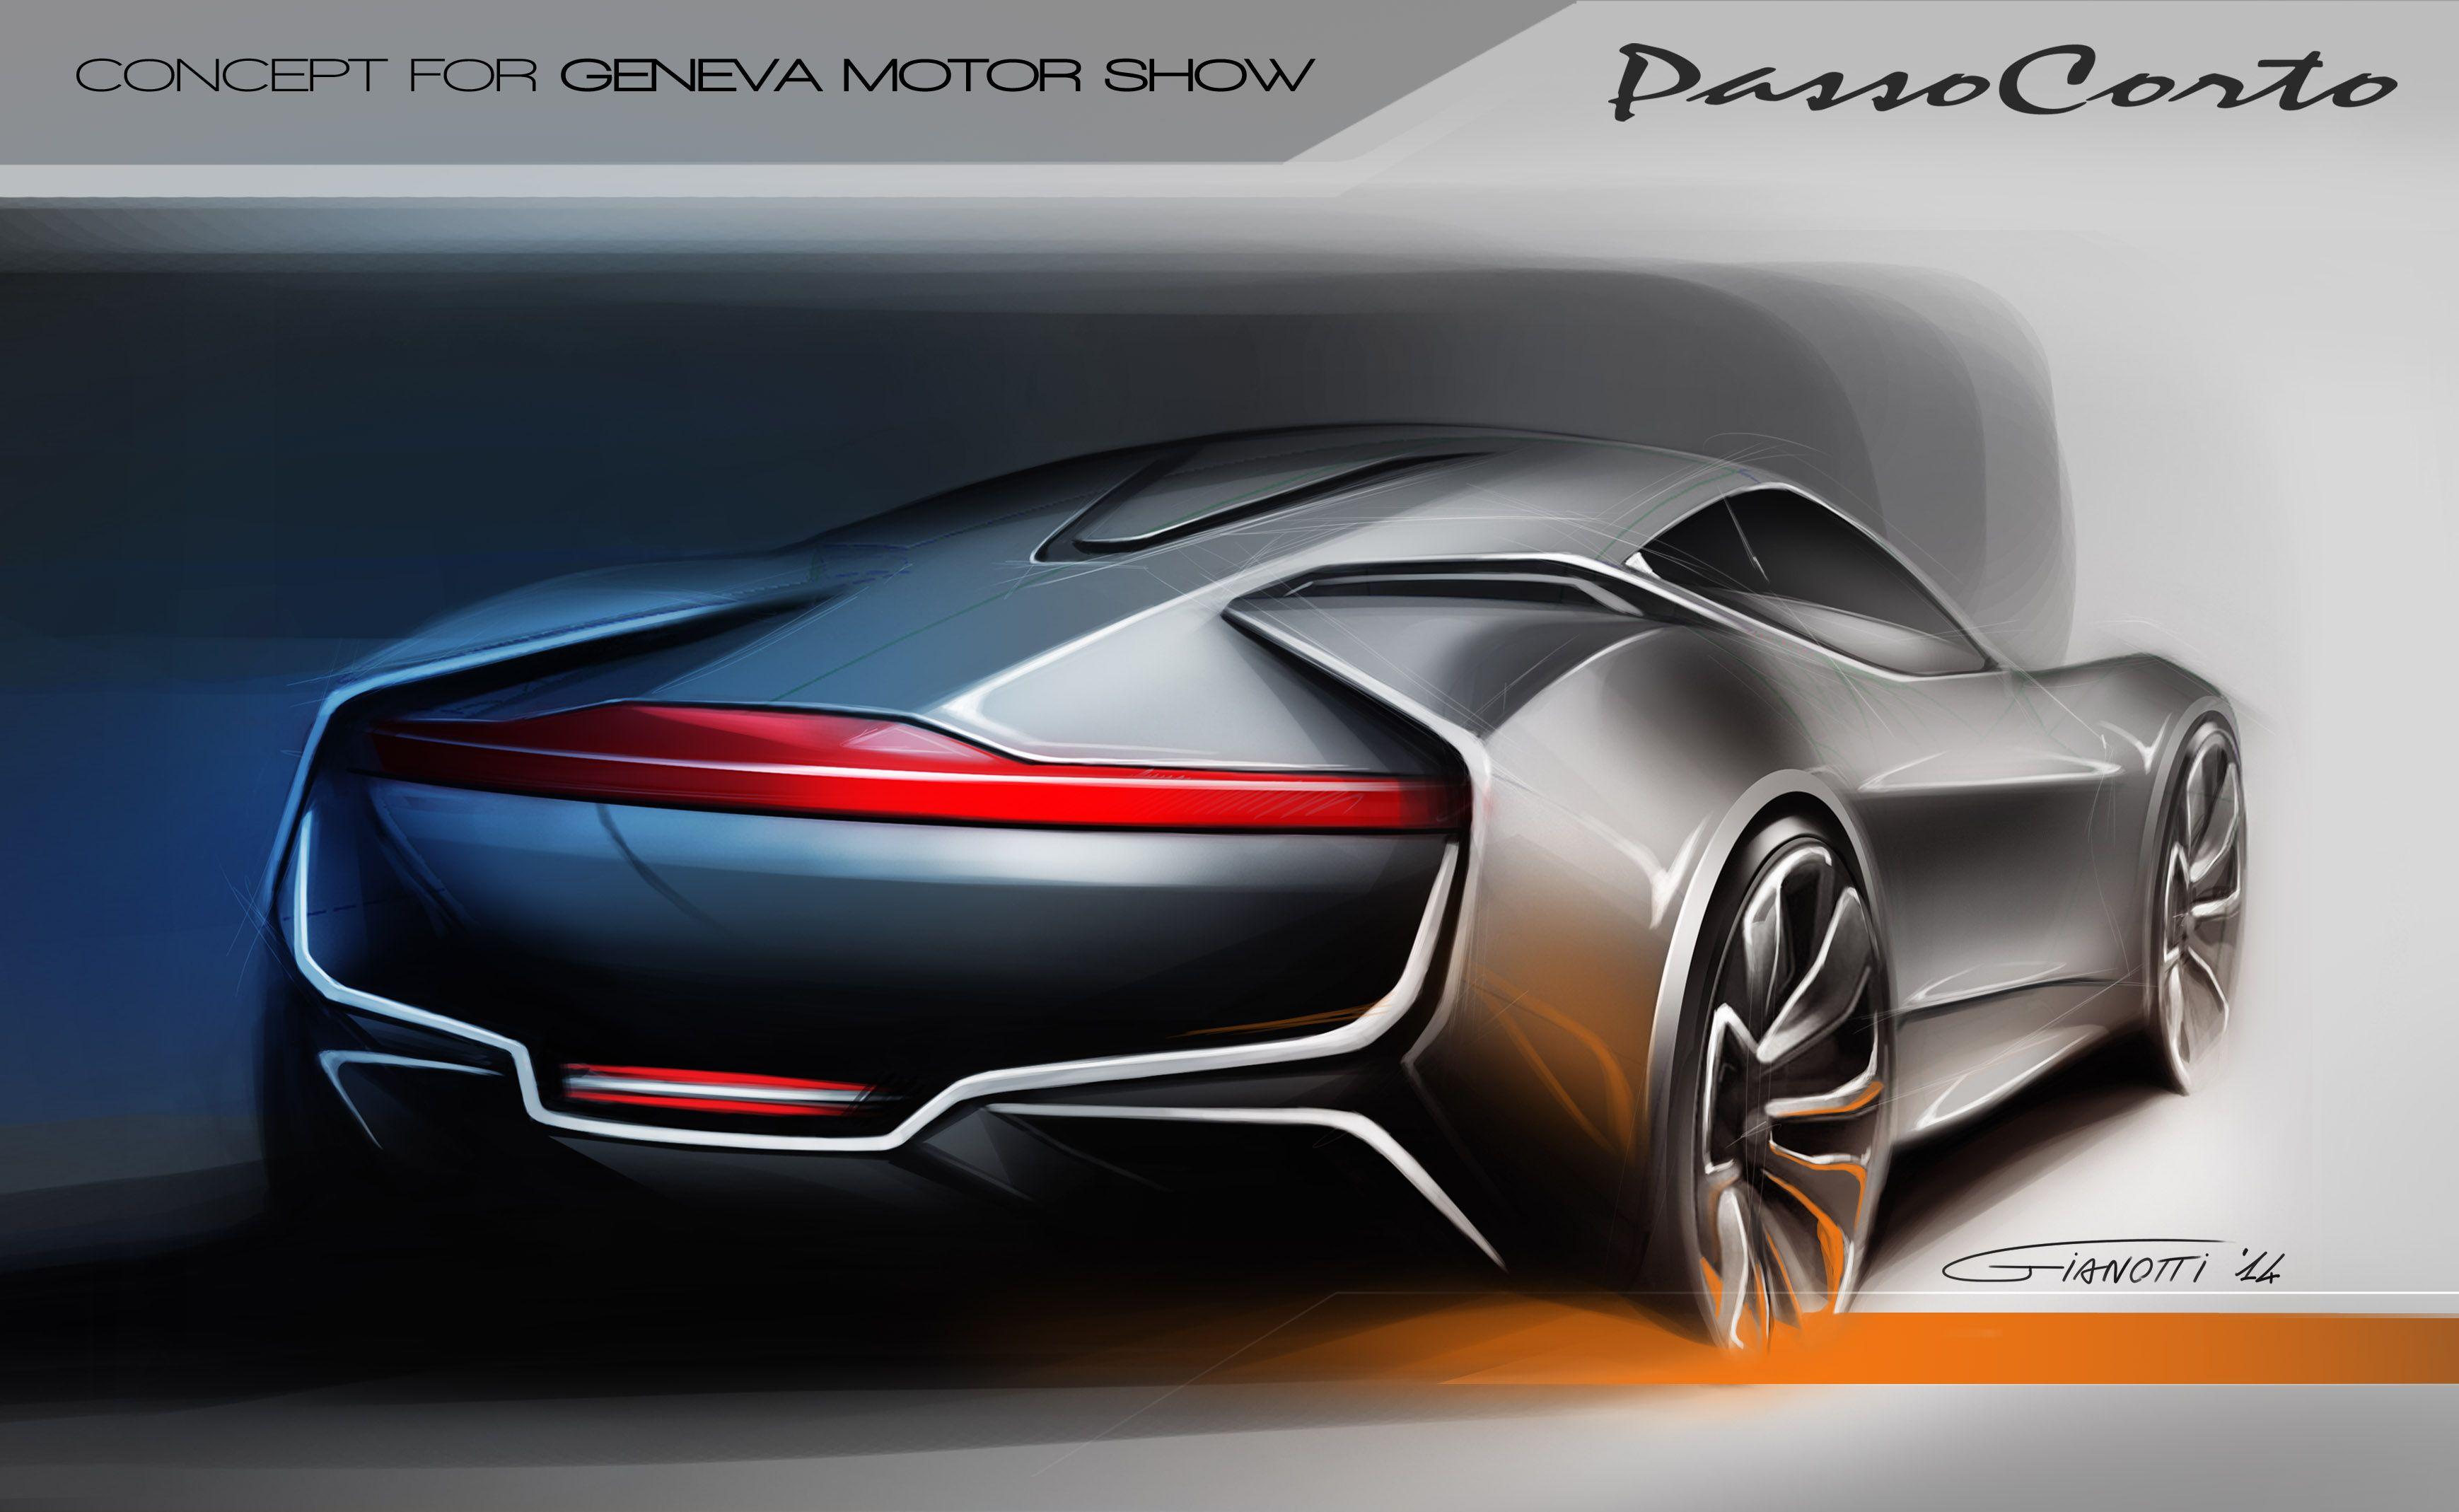 Project Hyundai Passocorto Sketch Rear View Marco Gianotti